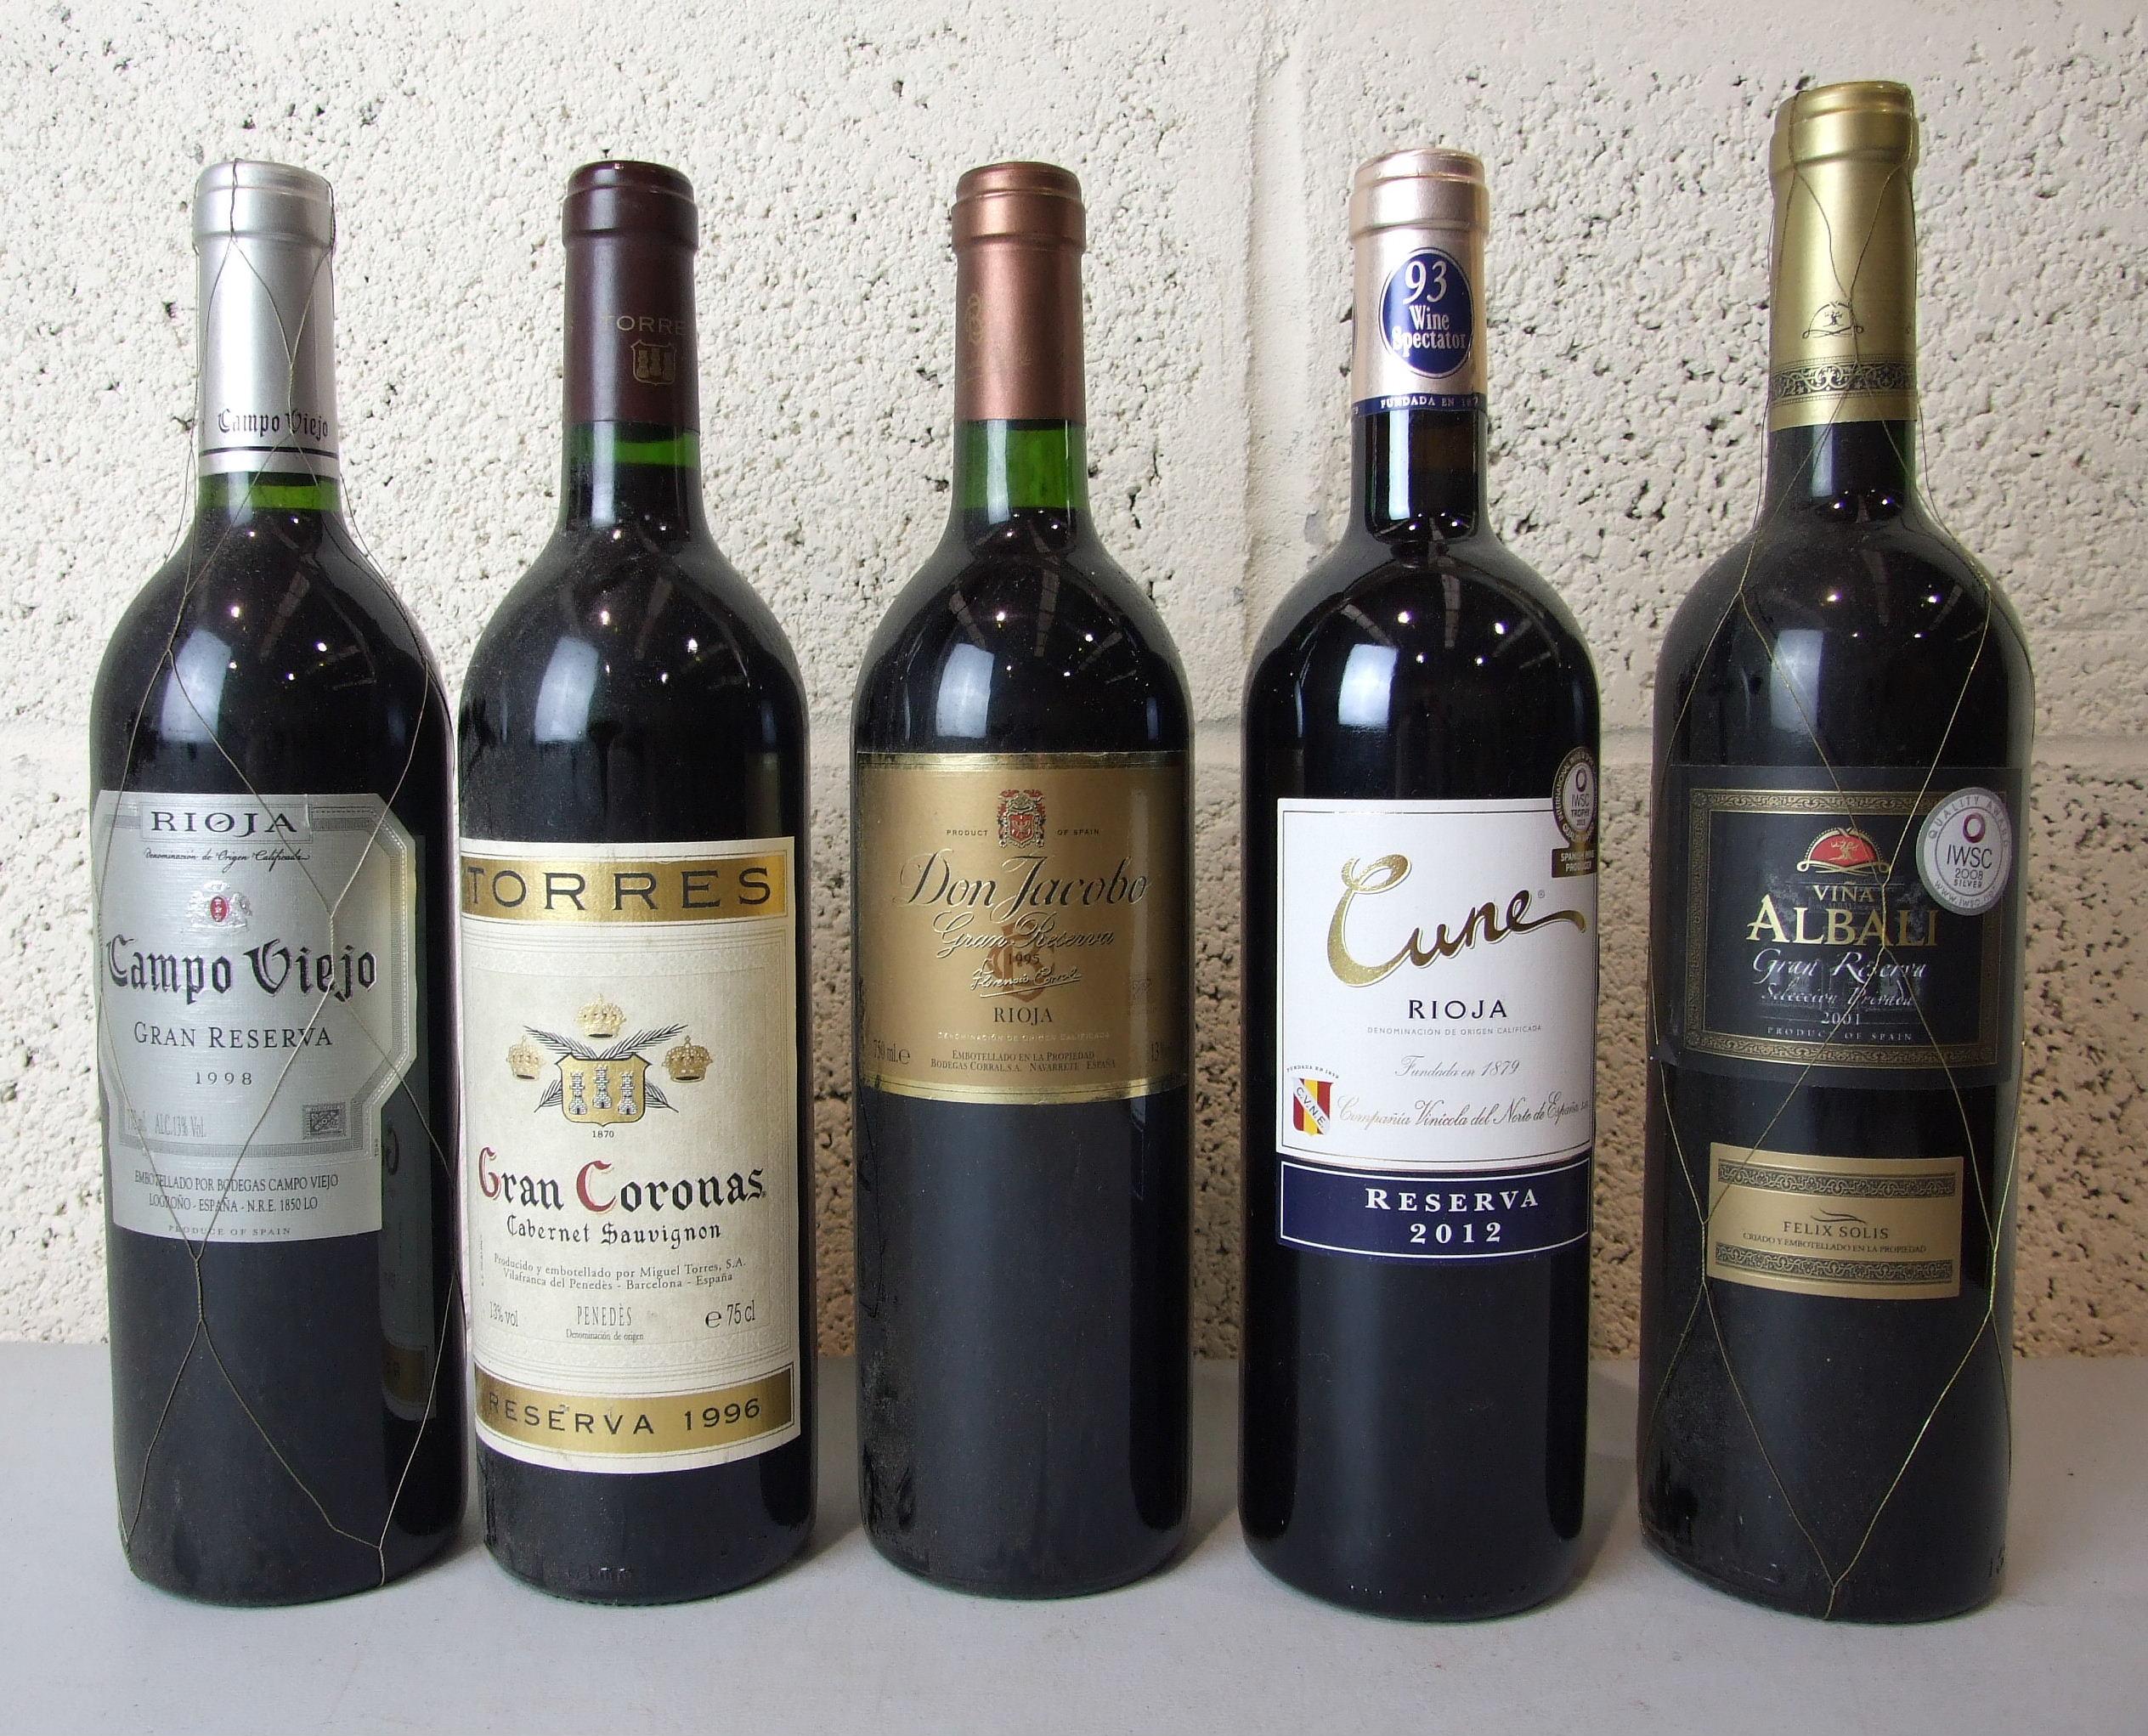 Lot 39 - Spain, Rioja, four bottles, mixed and Penedès Gran Coronas Reserva 1996, one bottle (5).